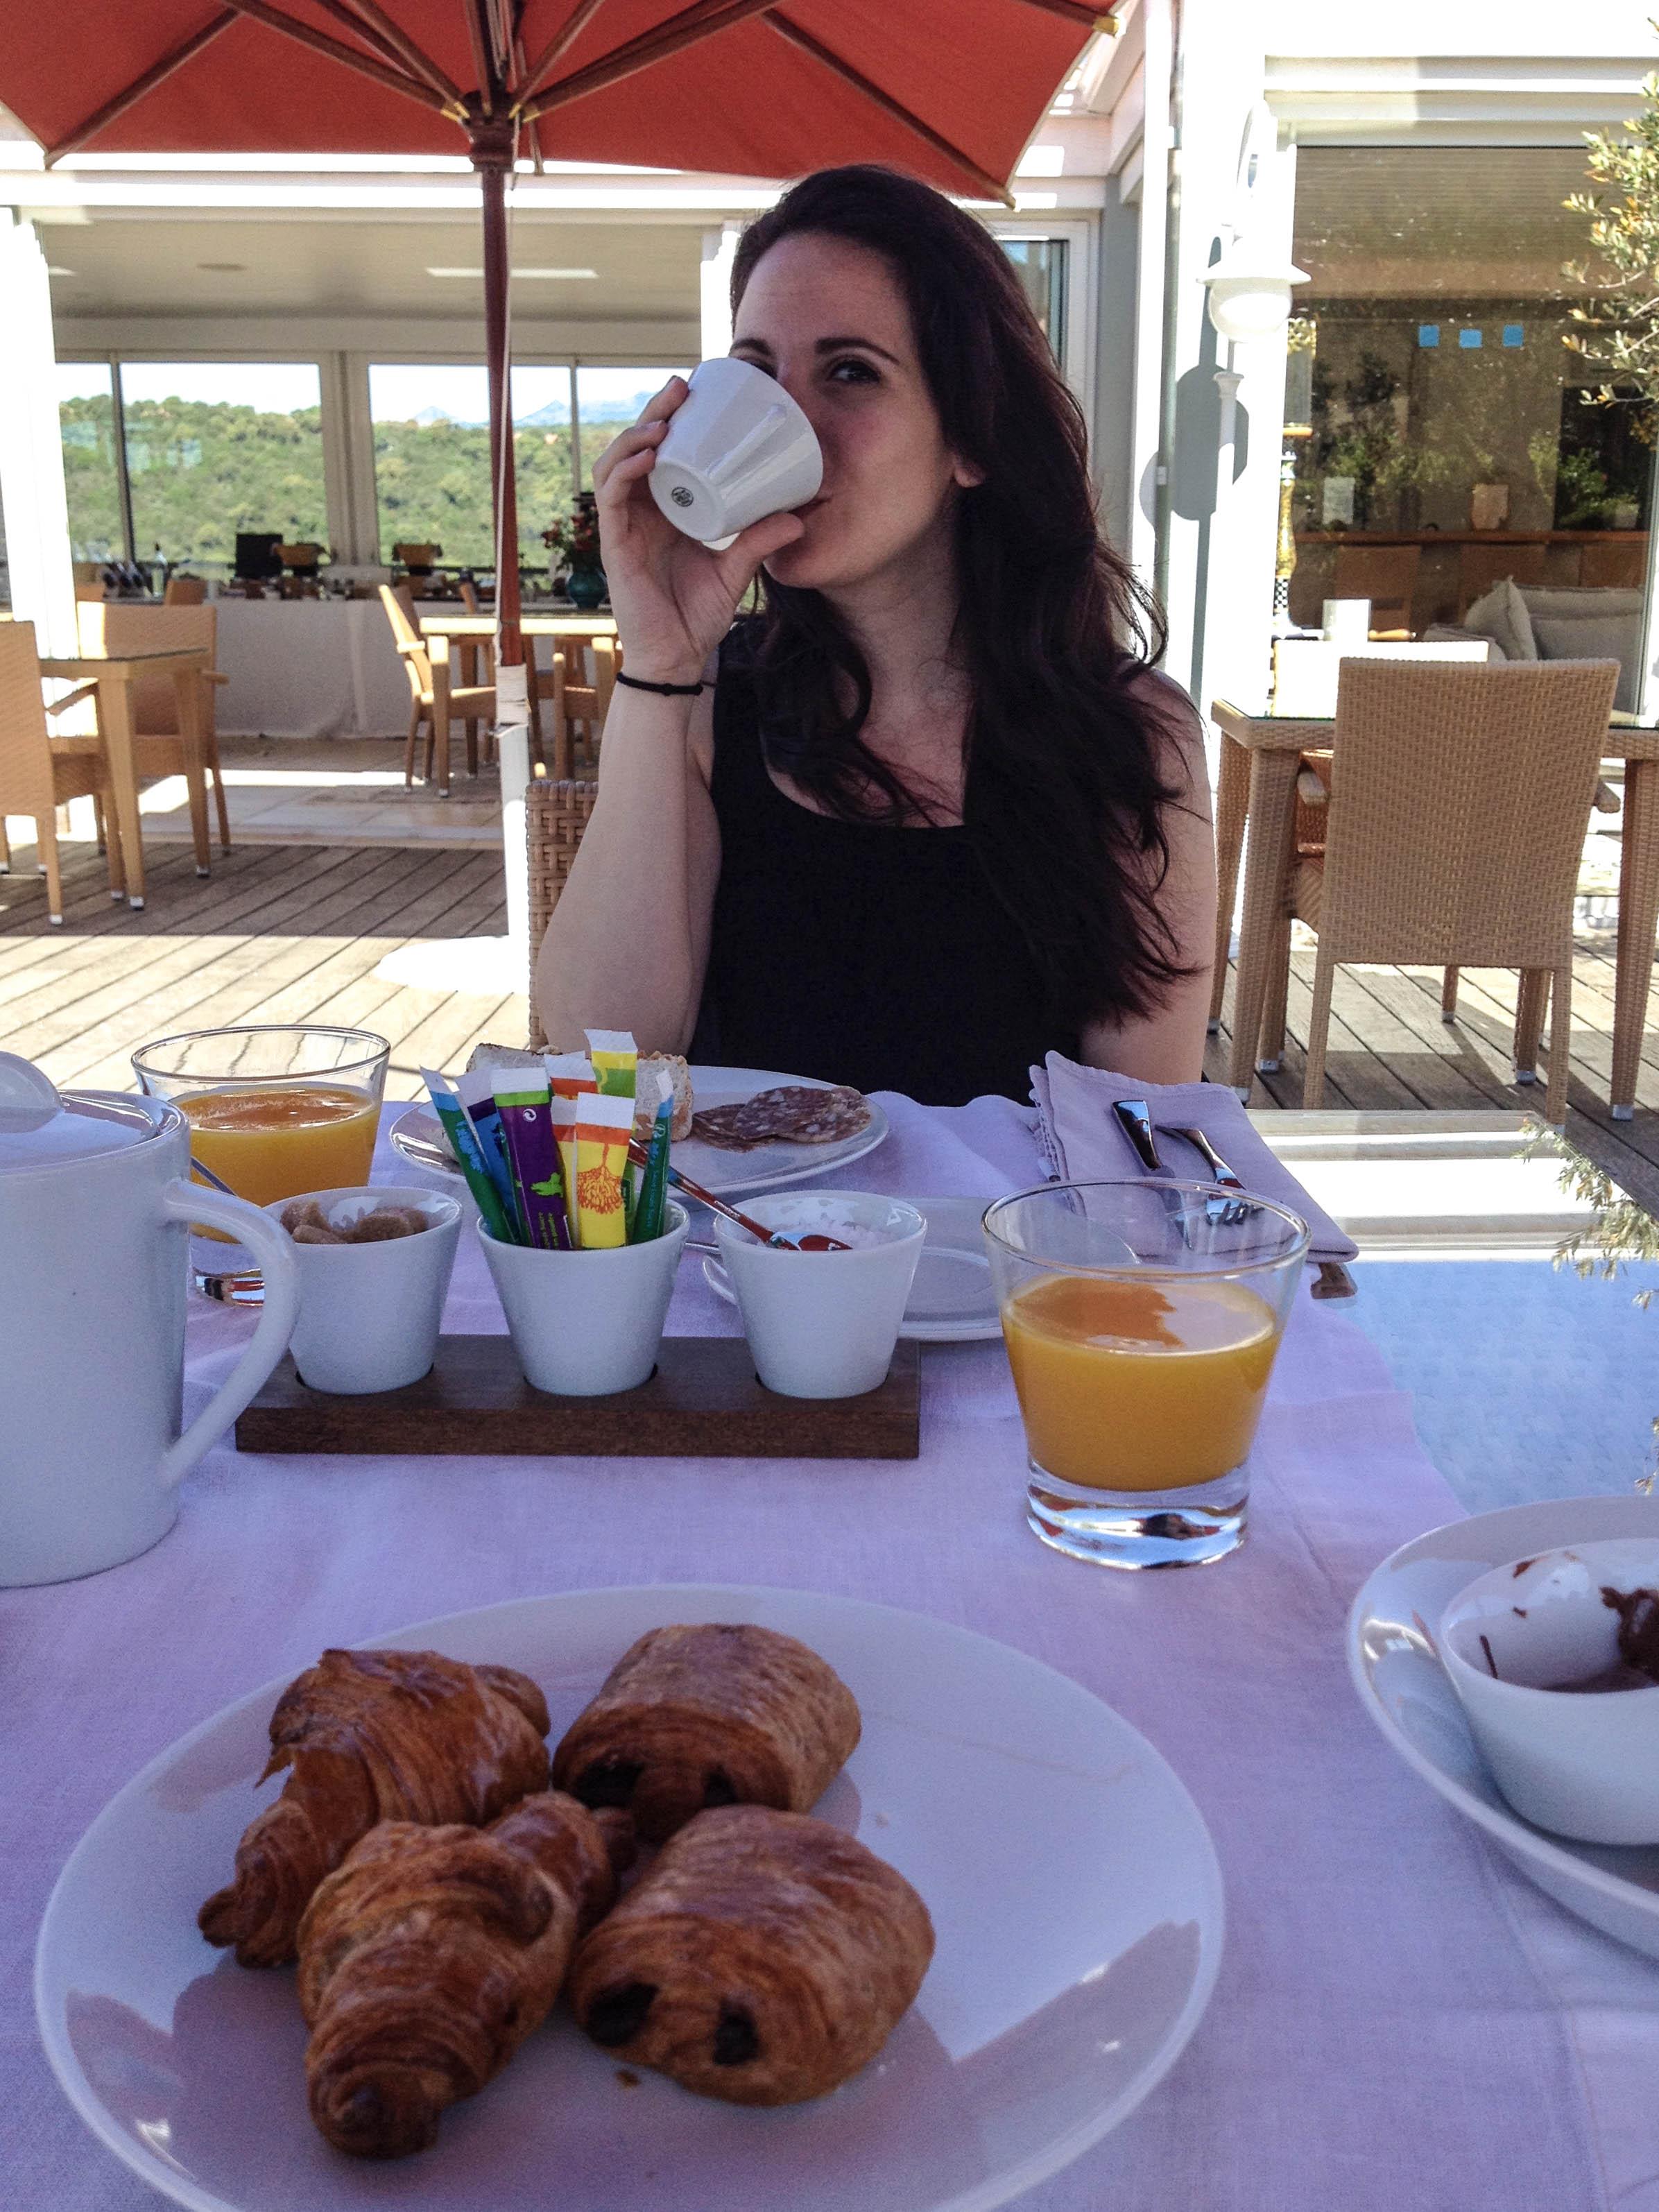 Corinne Stoppelli hôtel Alivi di Santa Guilia fauteuil roulant